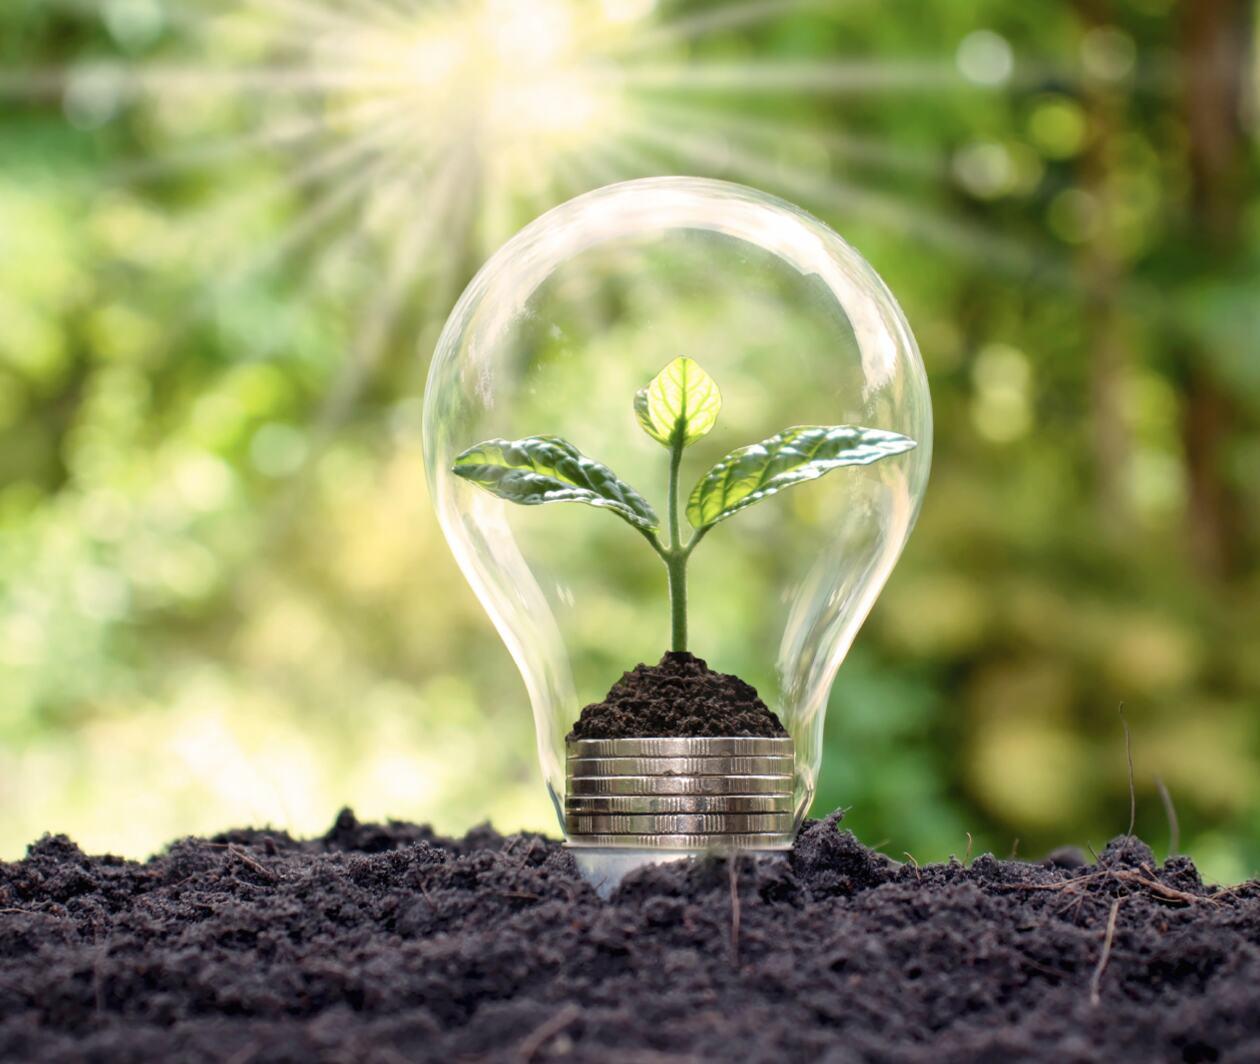 Renewable Energy: Achieving Sustainability through Bioenergy